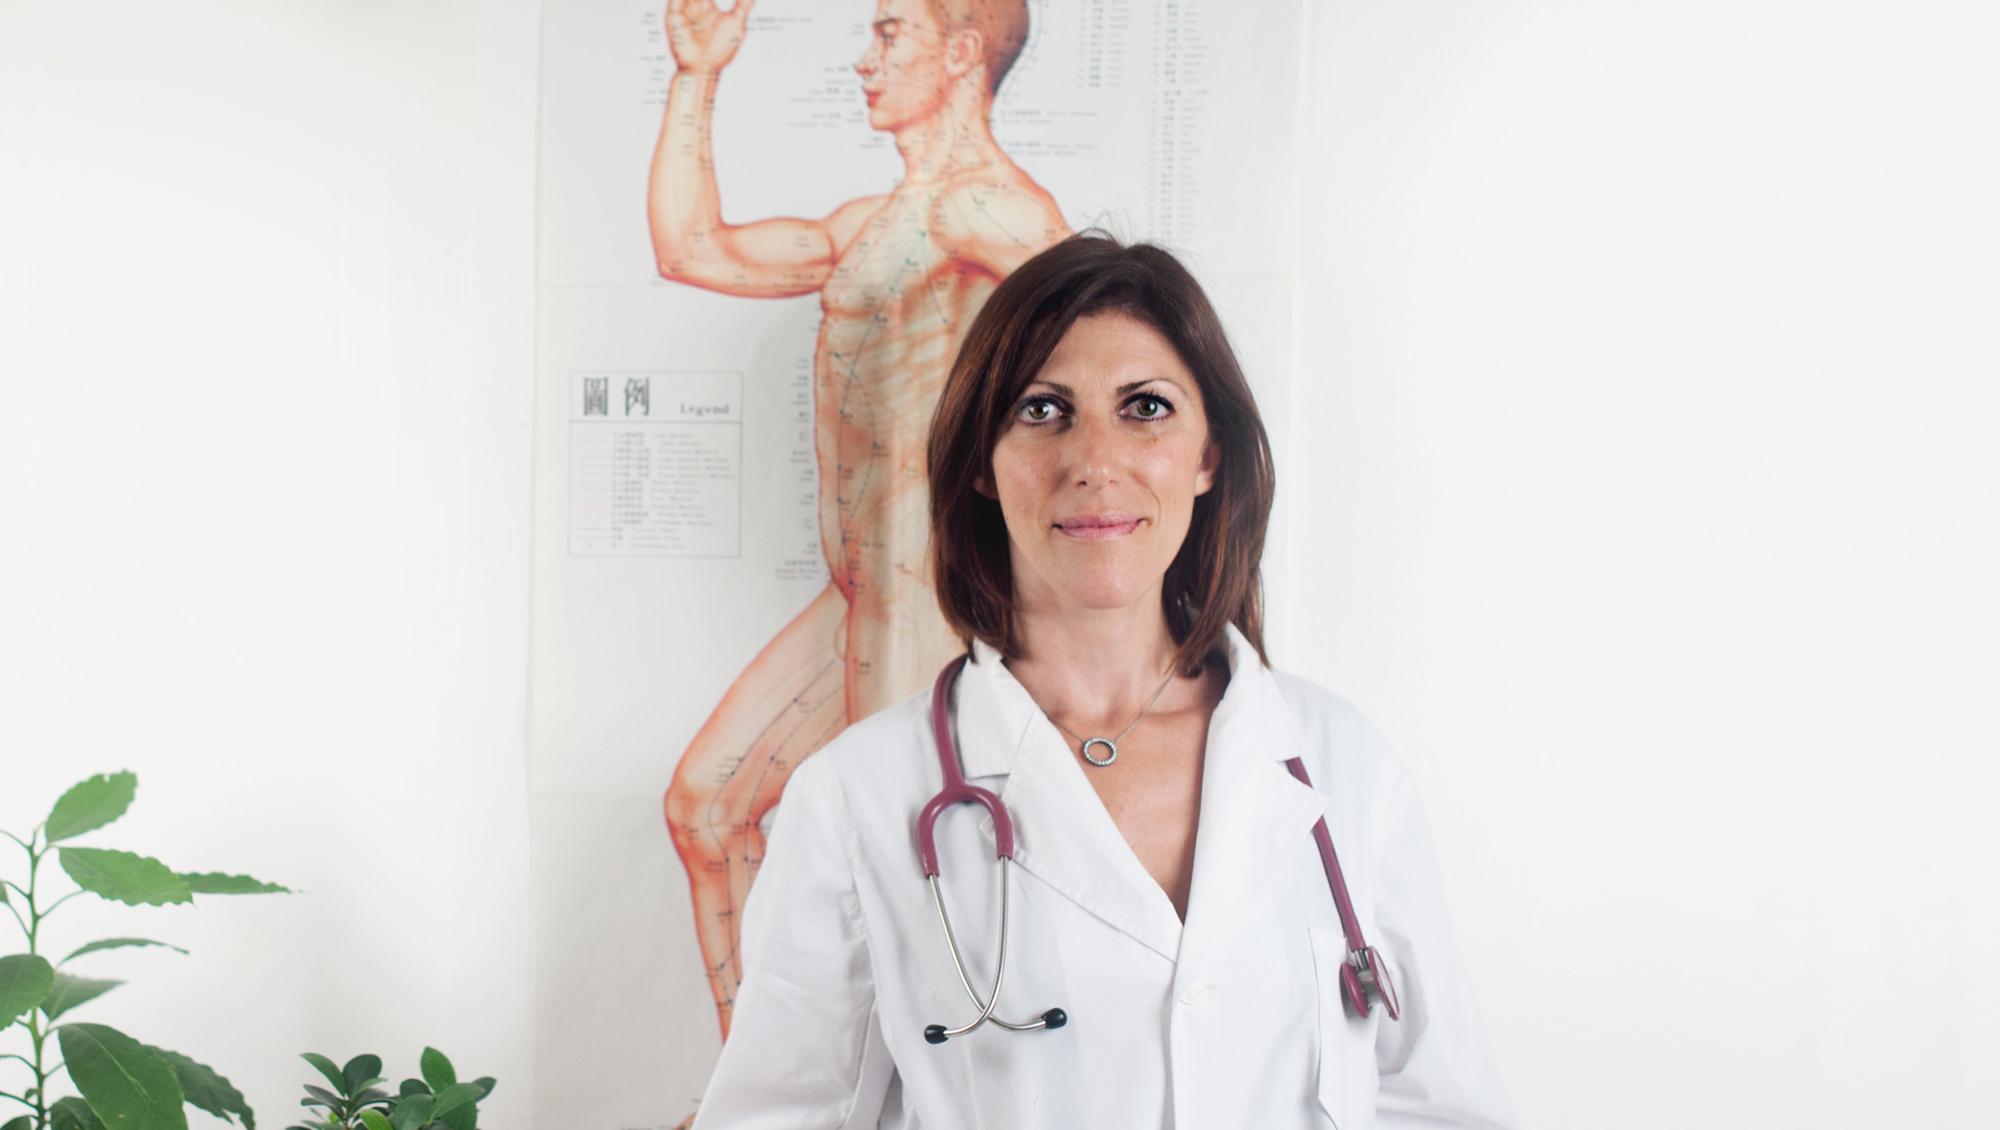 Dott. Erica Bava agopuntura